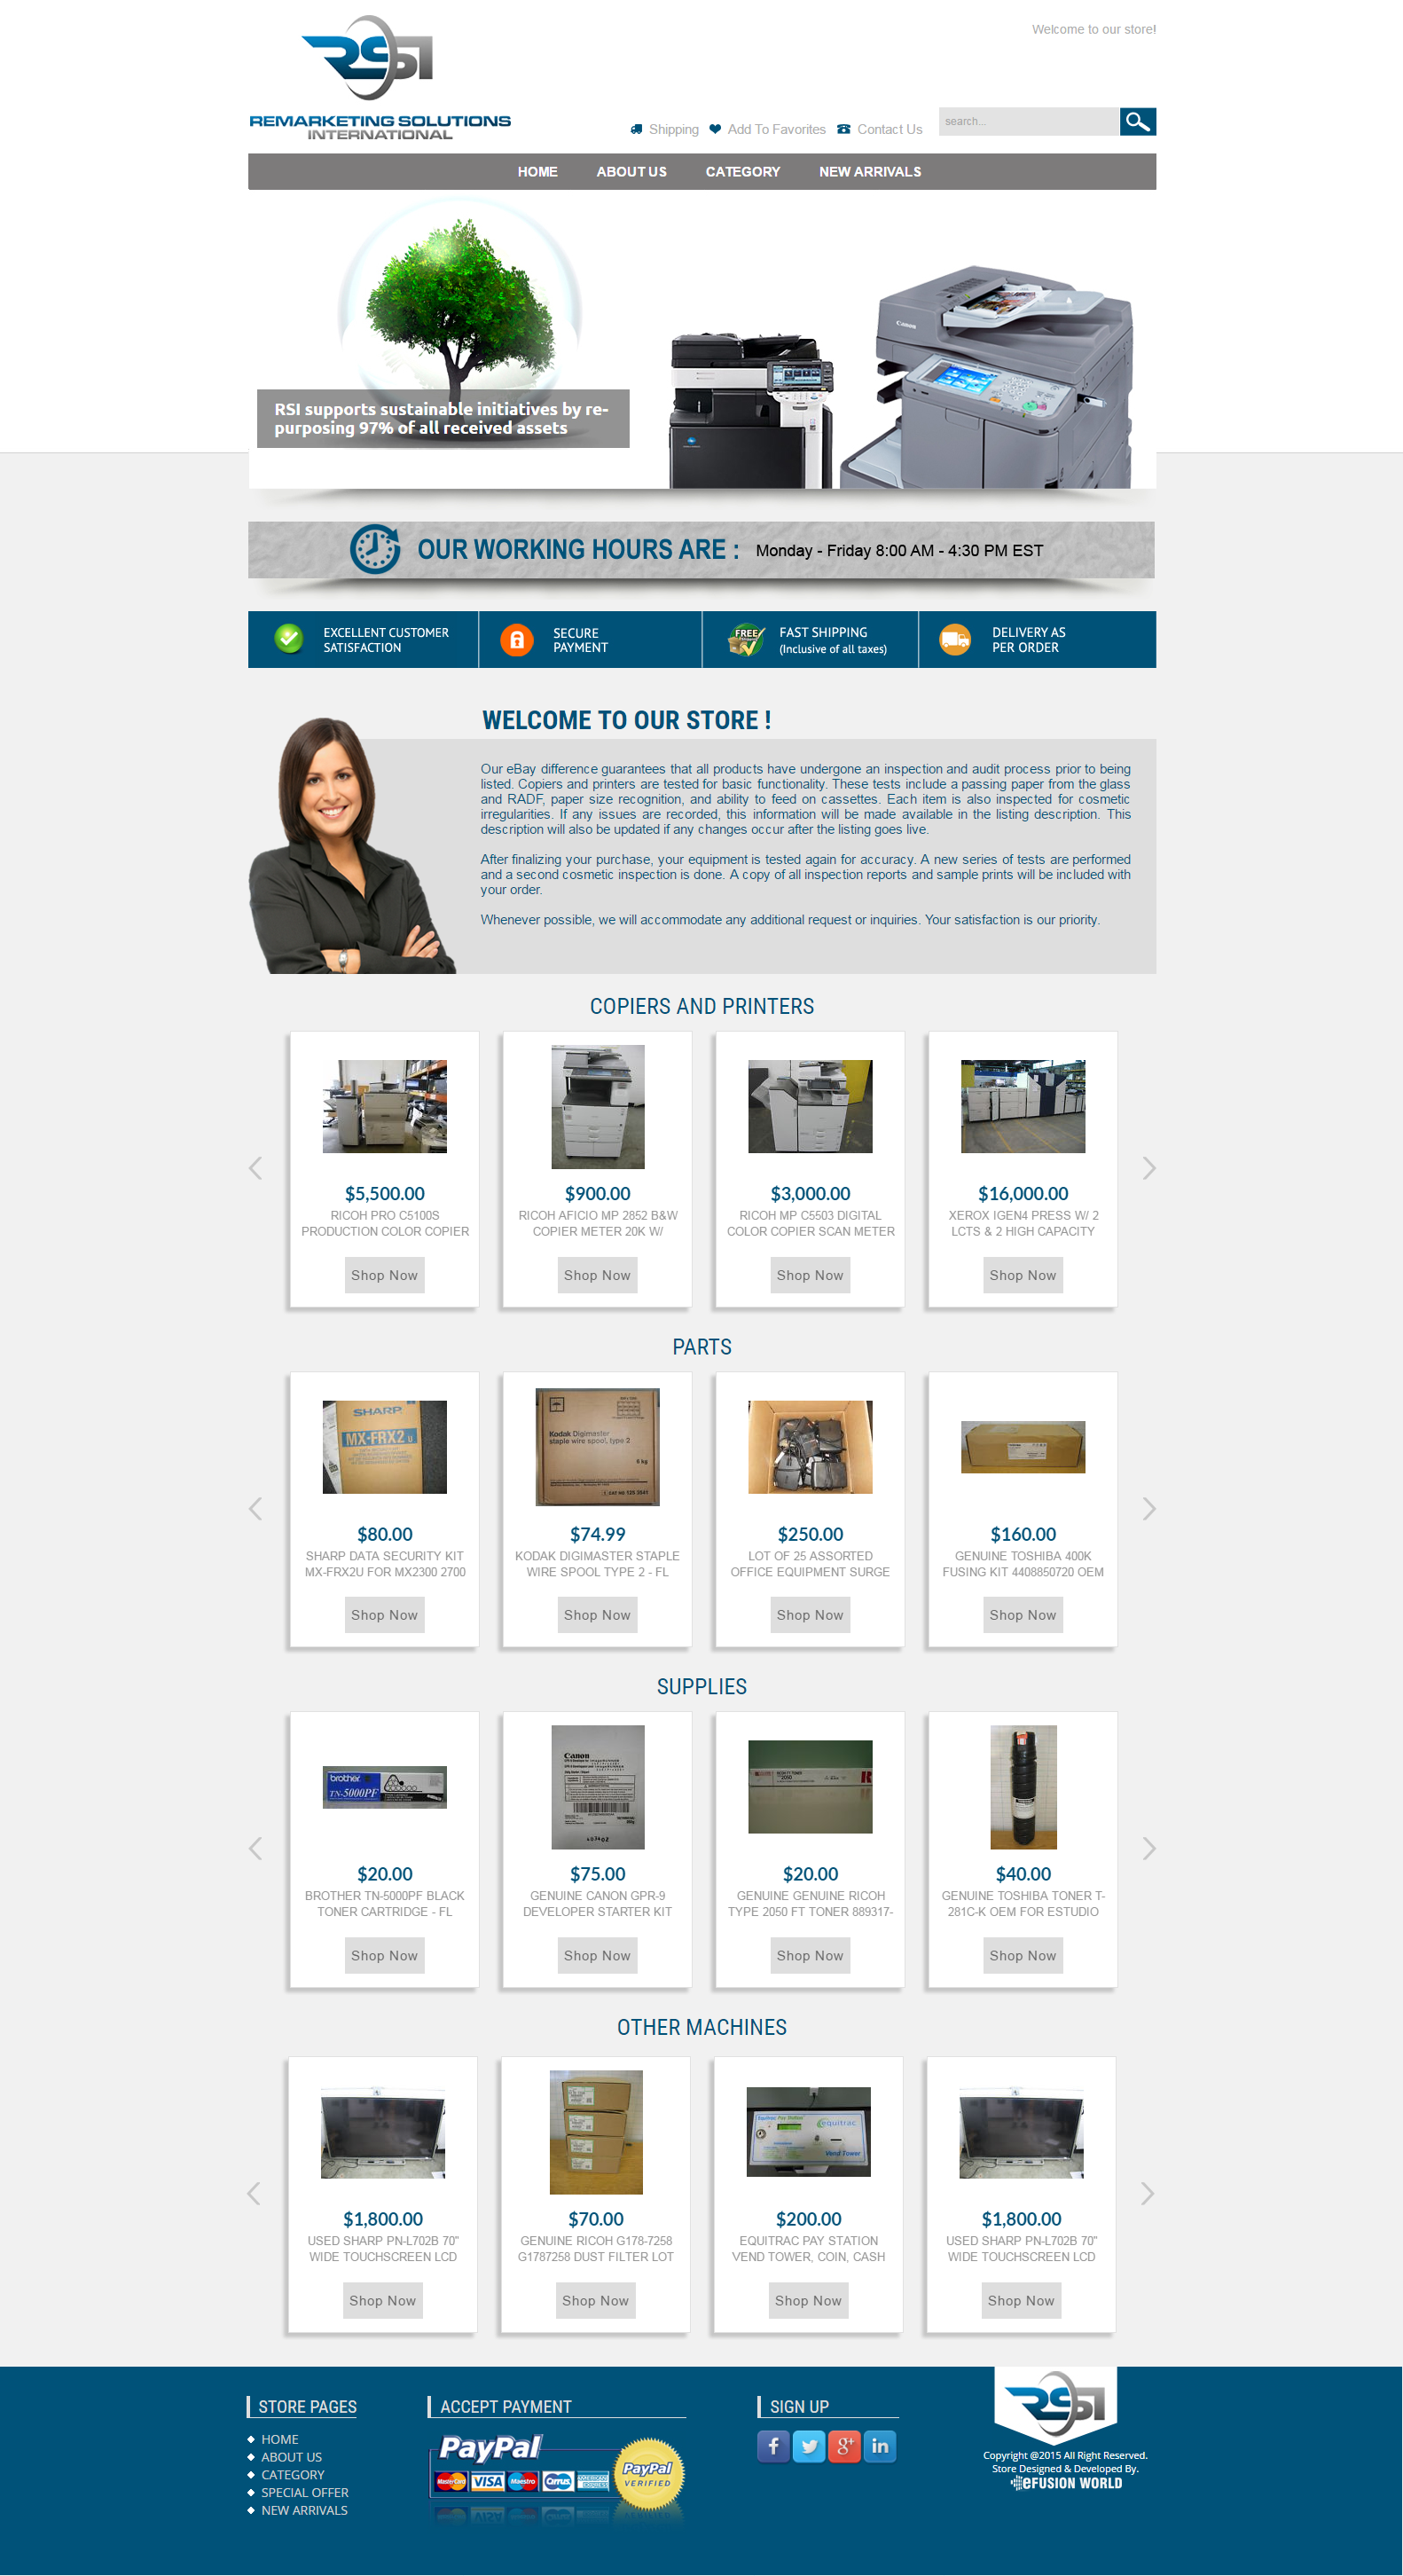 Efusionworld Is A Leading Web Design Agency Based In New Jersey We Provide Award Winning Ecommerce W Service Design Website Design Services Website Design